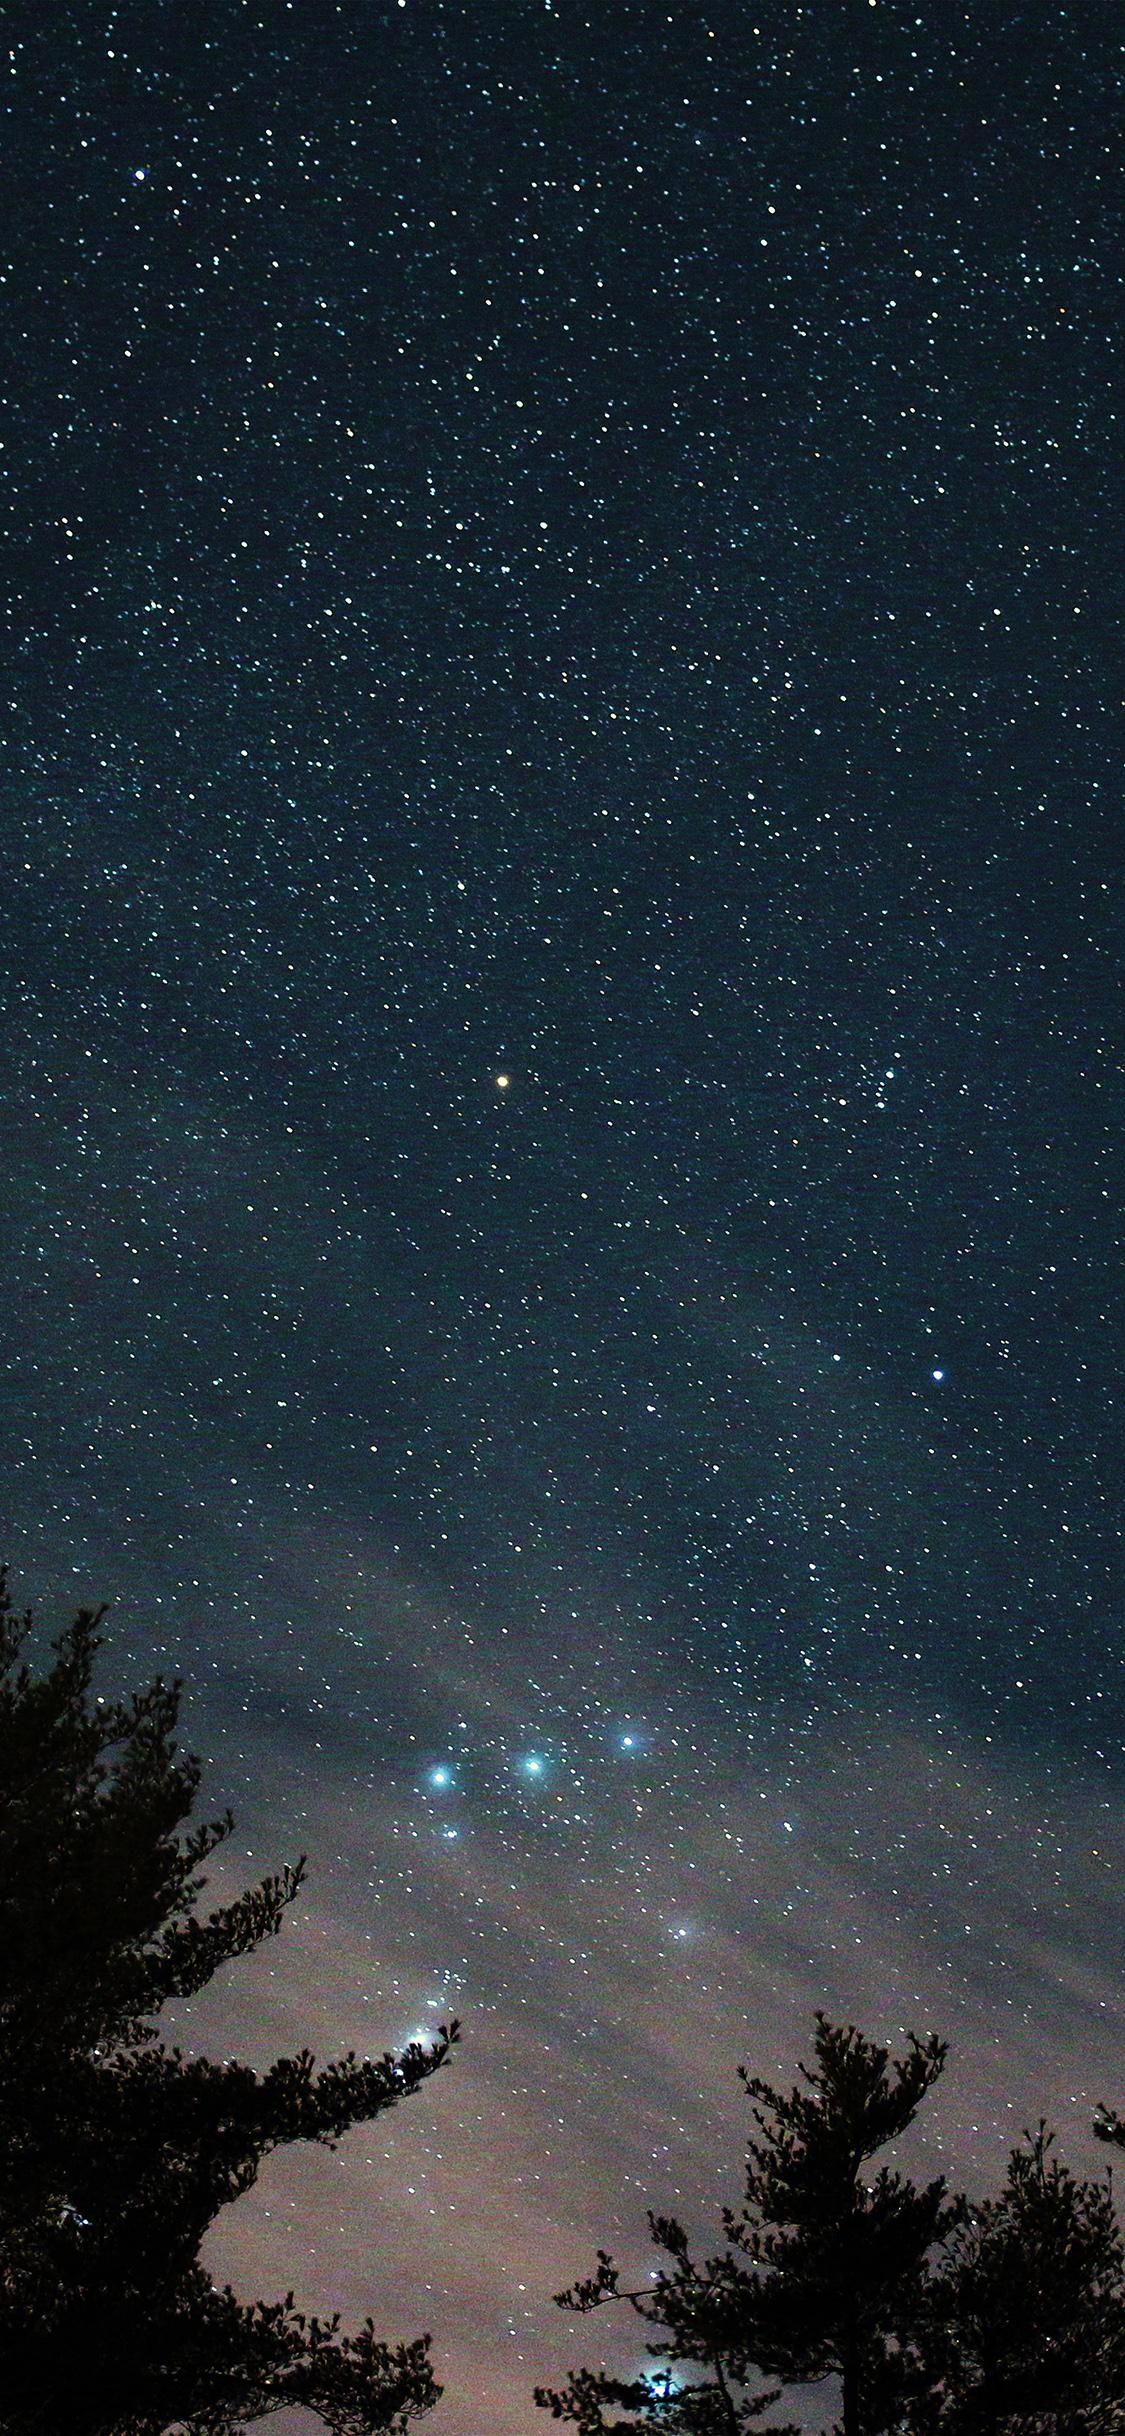 Iphonexpaperscom Iphone X Wallpaper Ni85 Night Sky Star